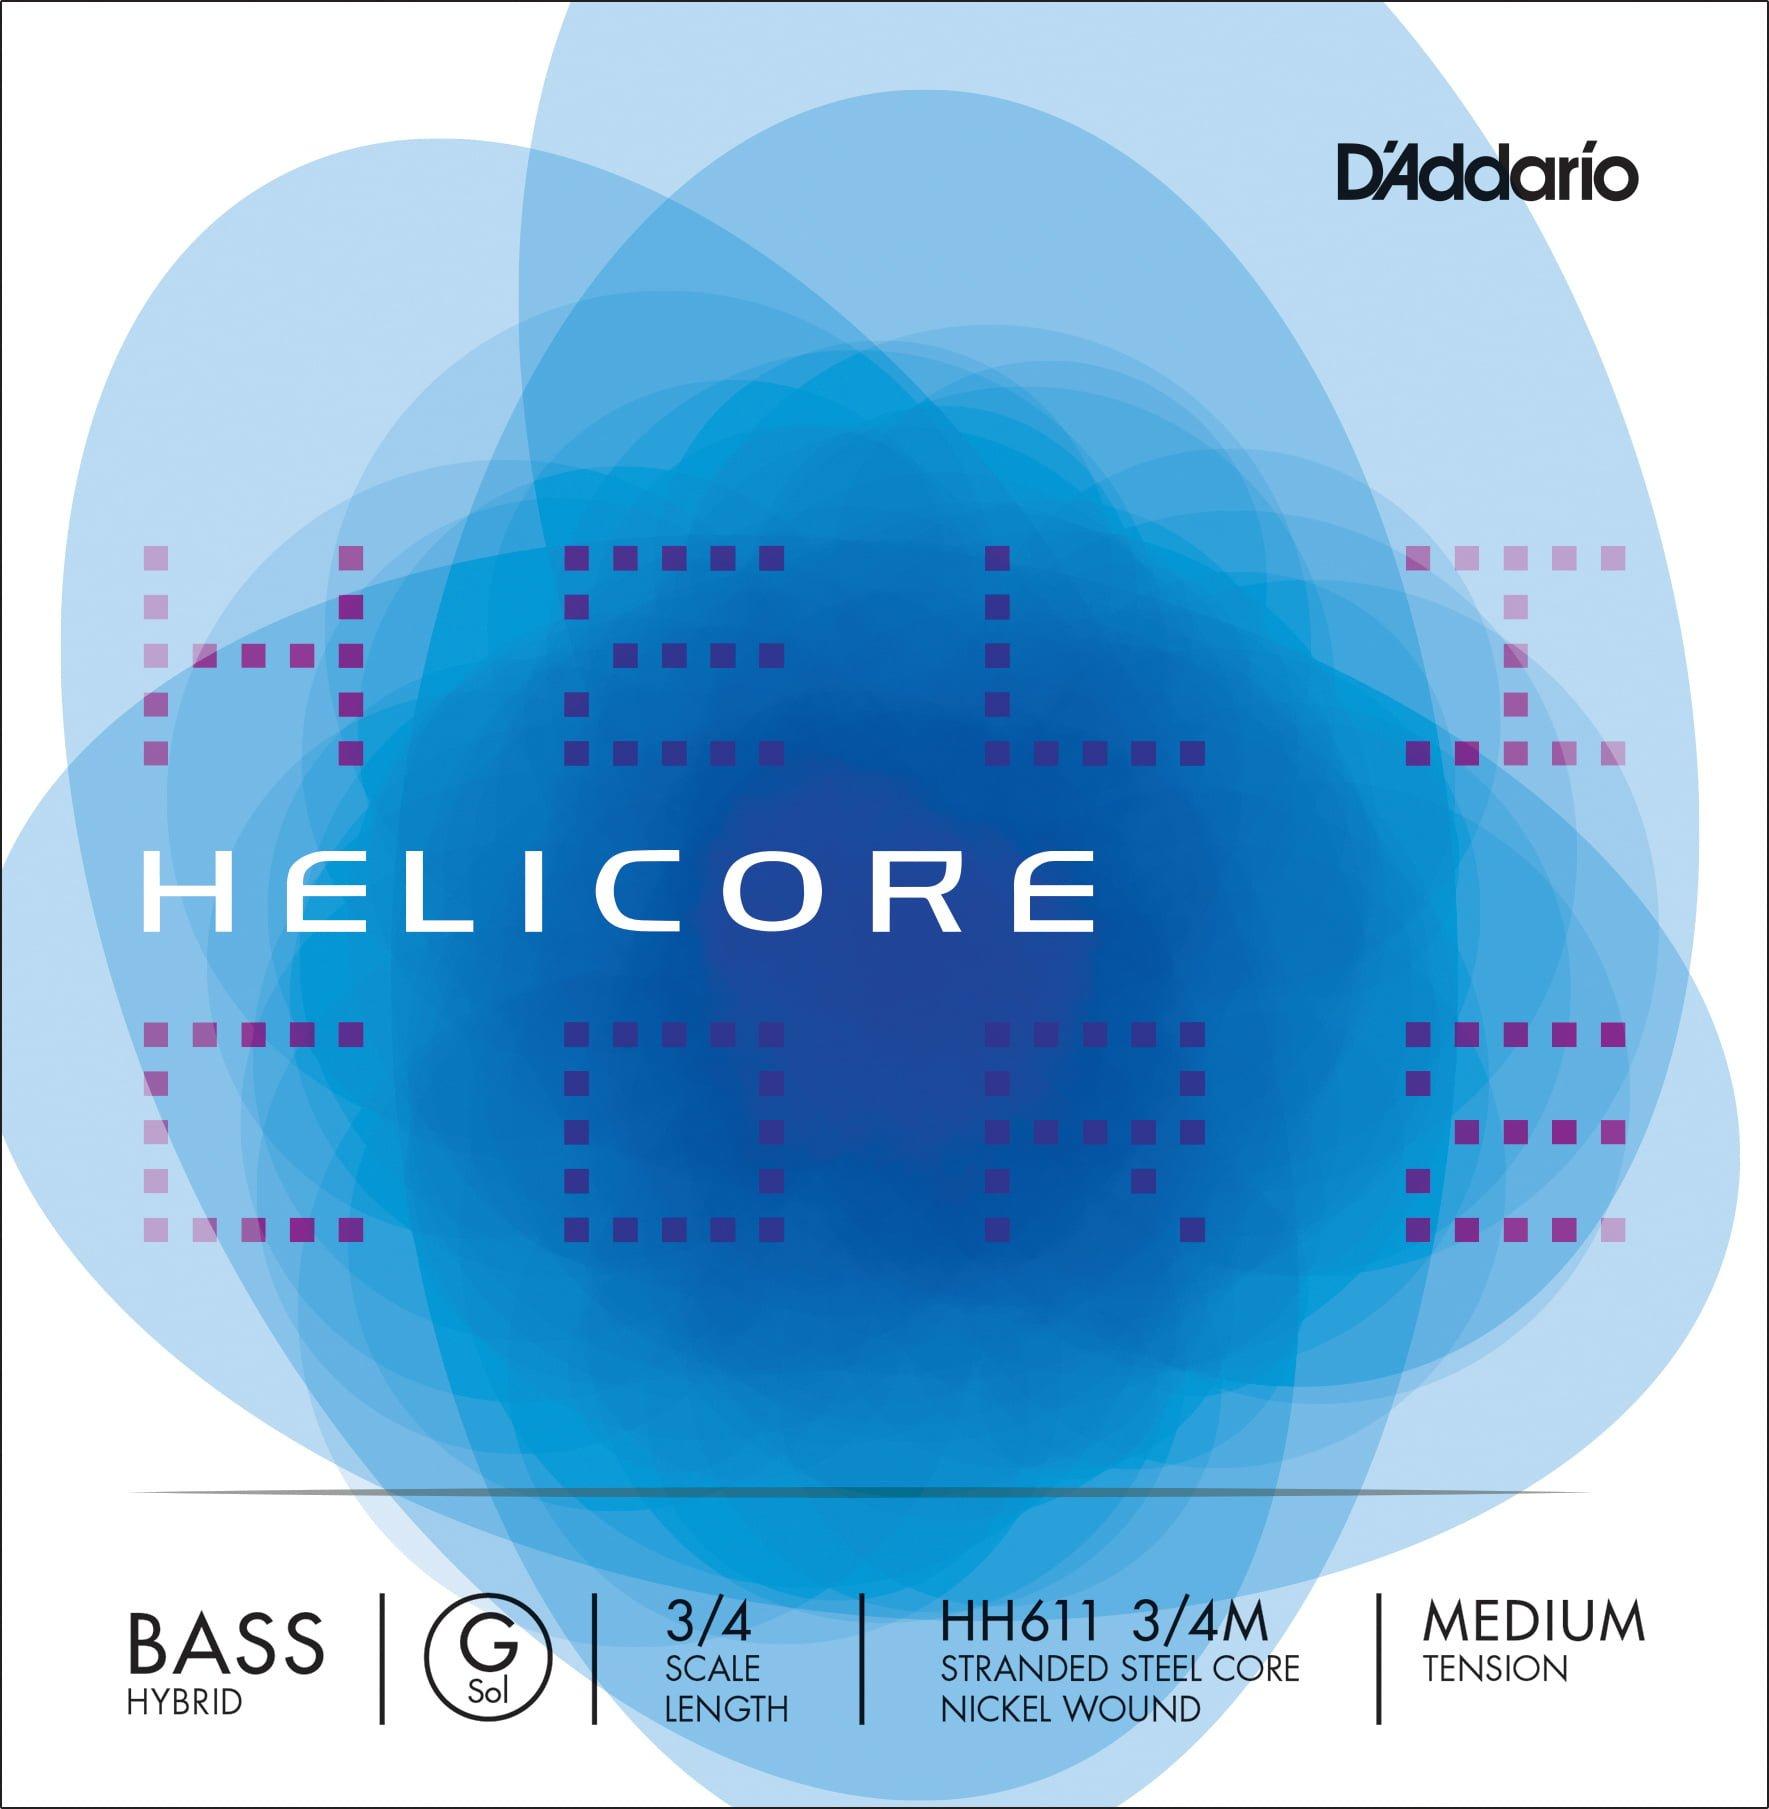 Helicore Hybrid Double Bass G String 3/4 Medium